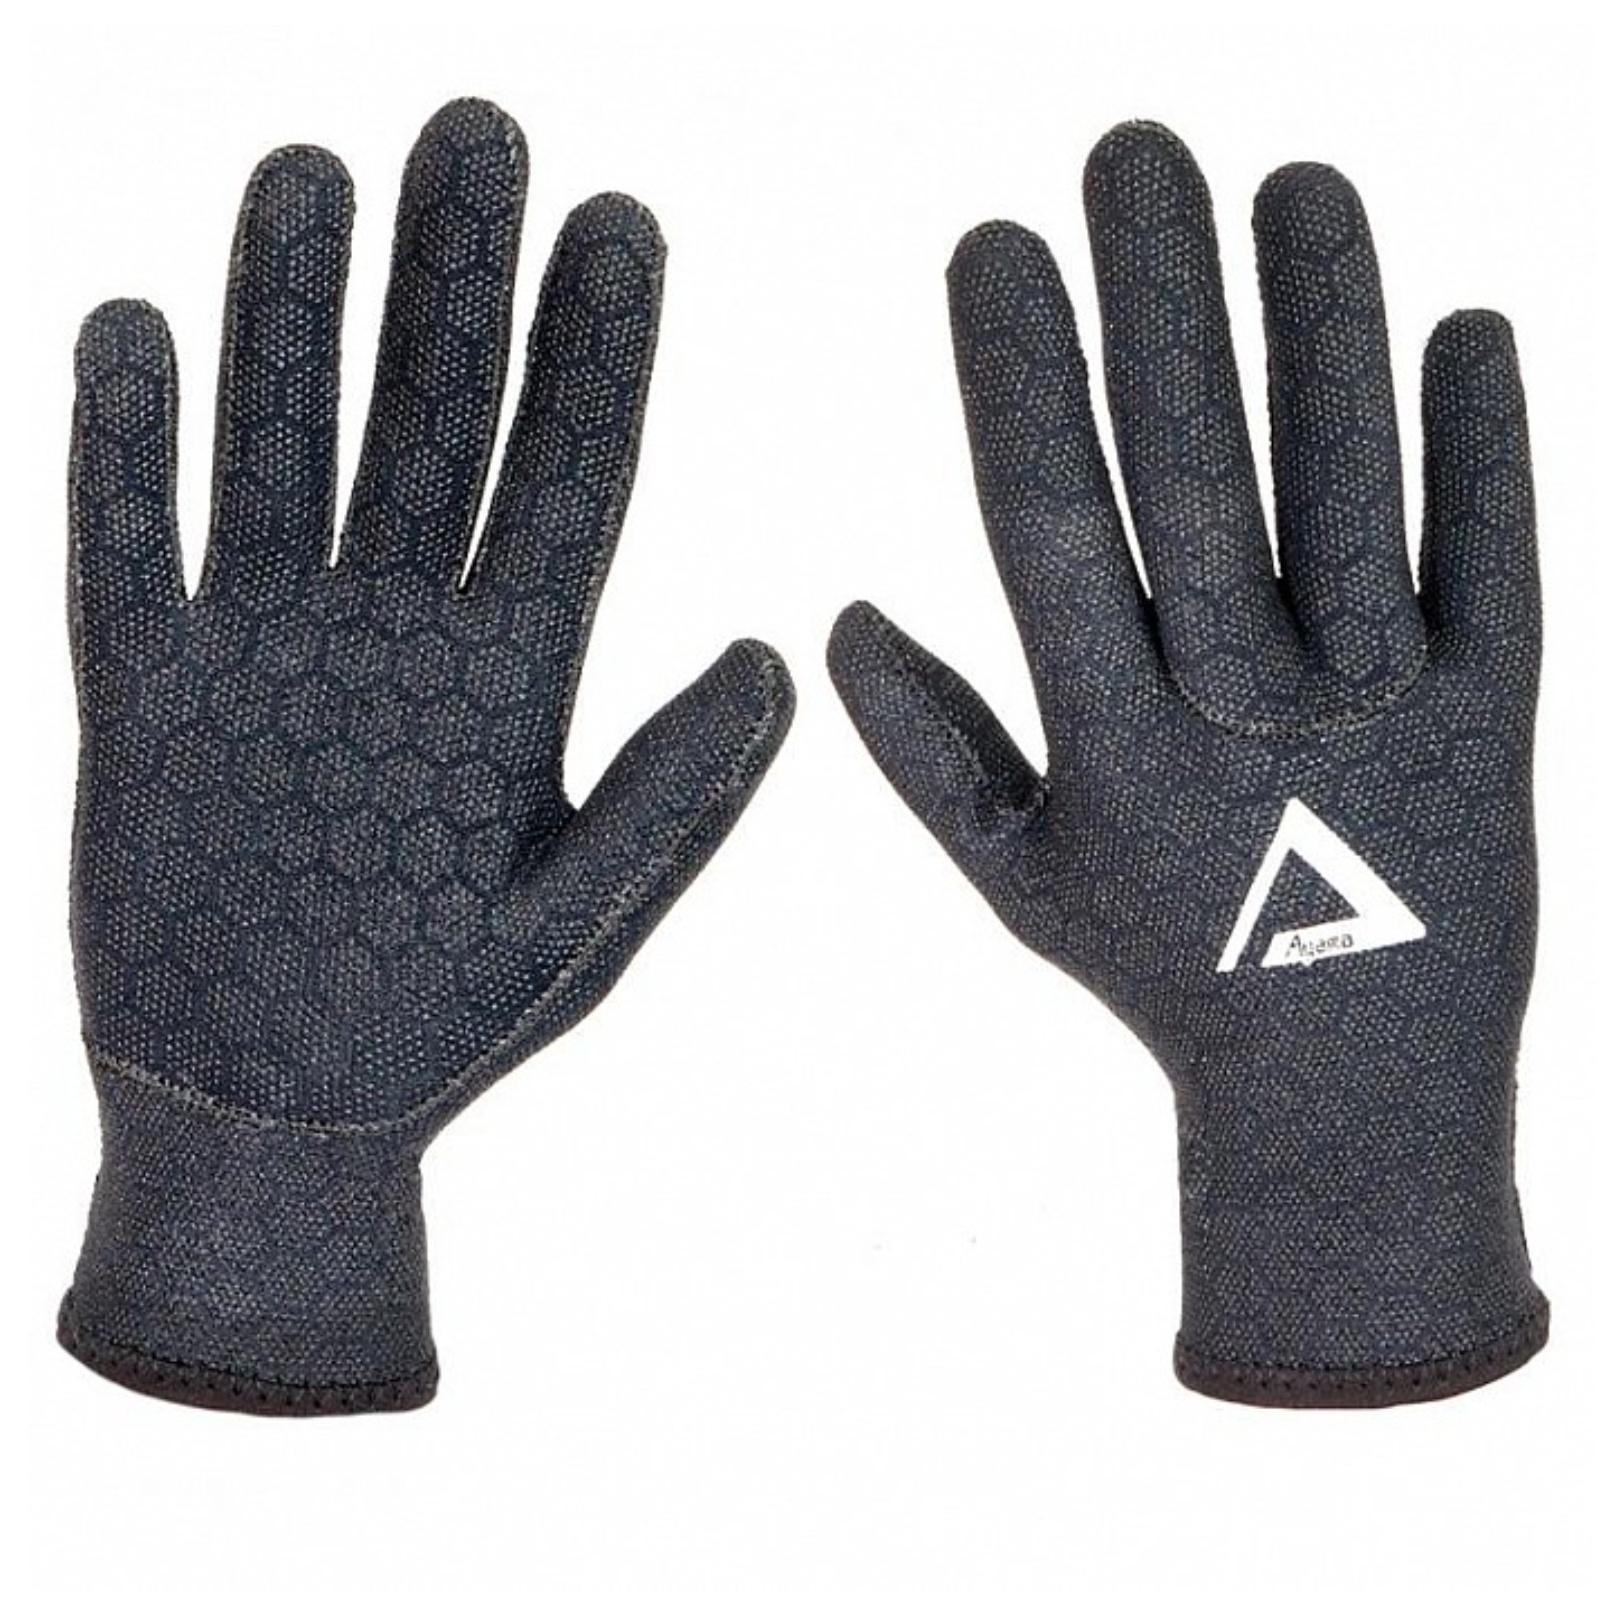 Neoprenové rukavice AGAMA Superstretch 1,5 mm